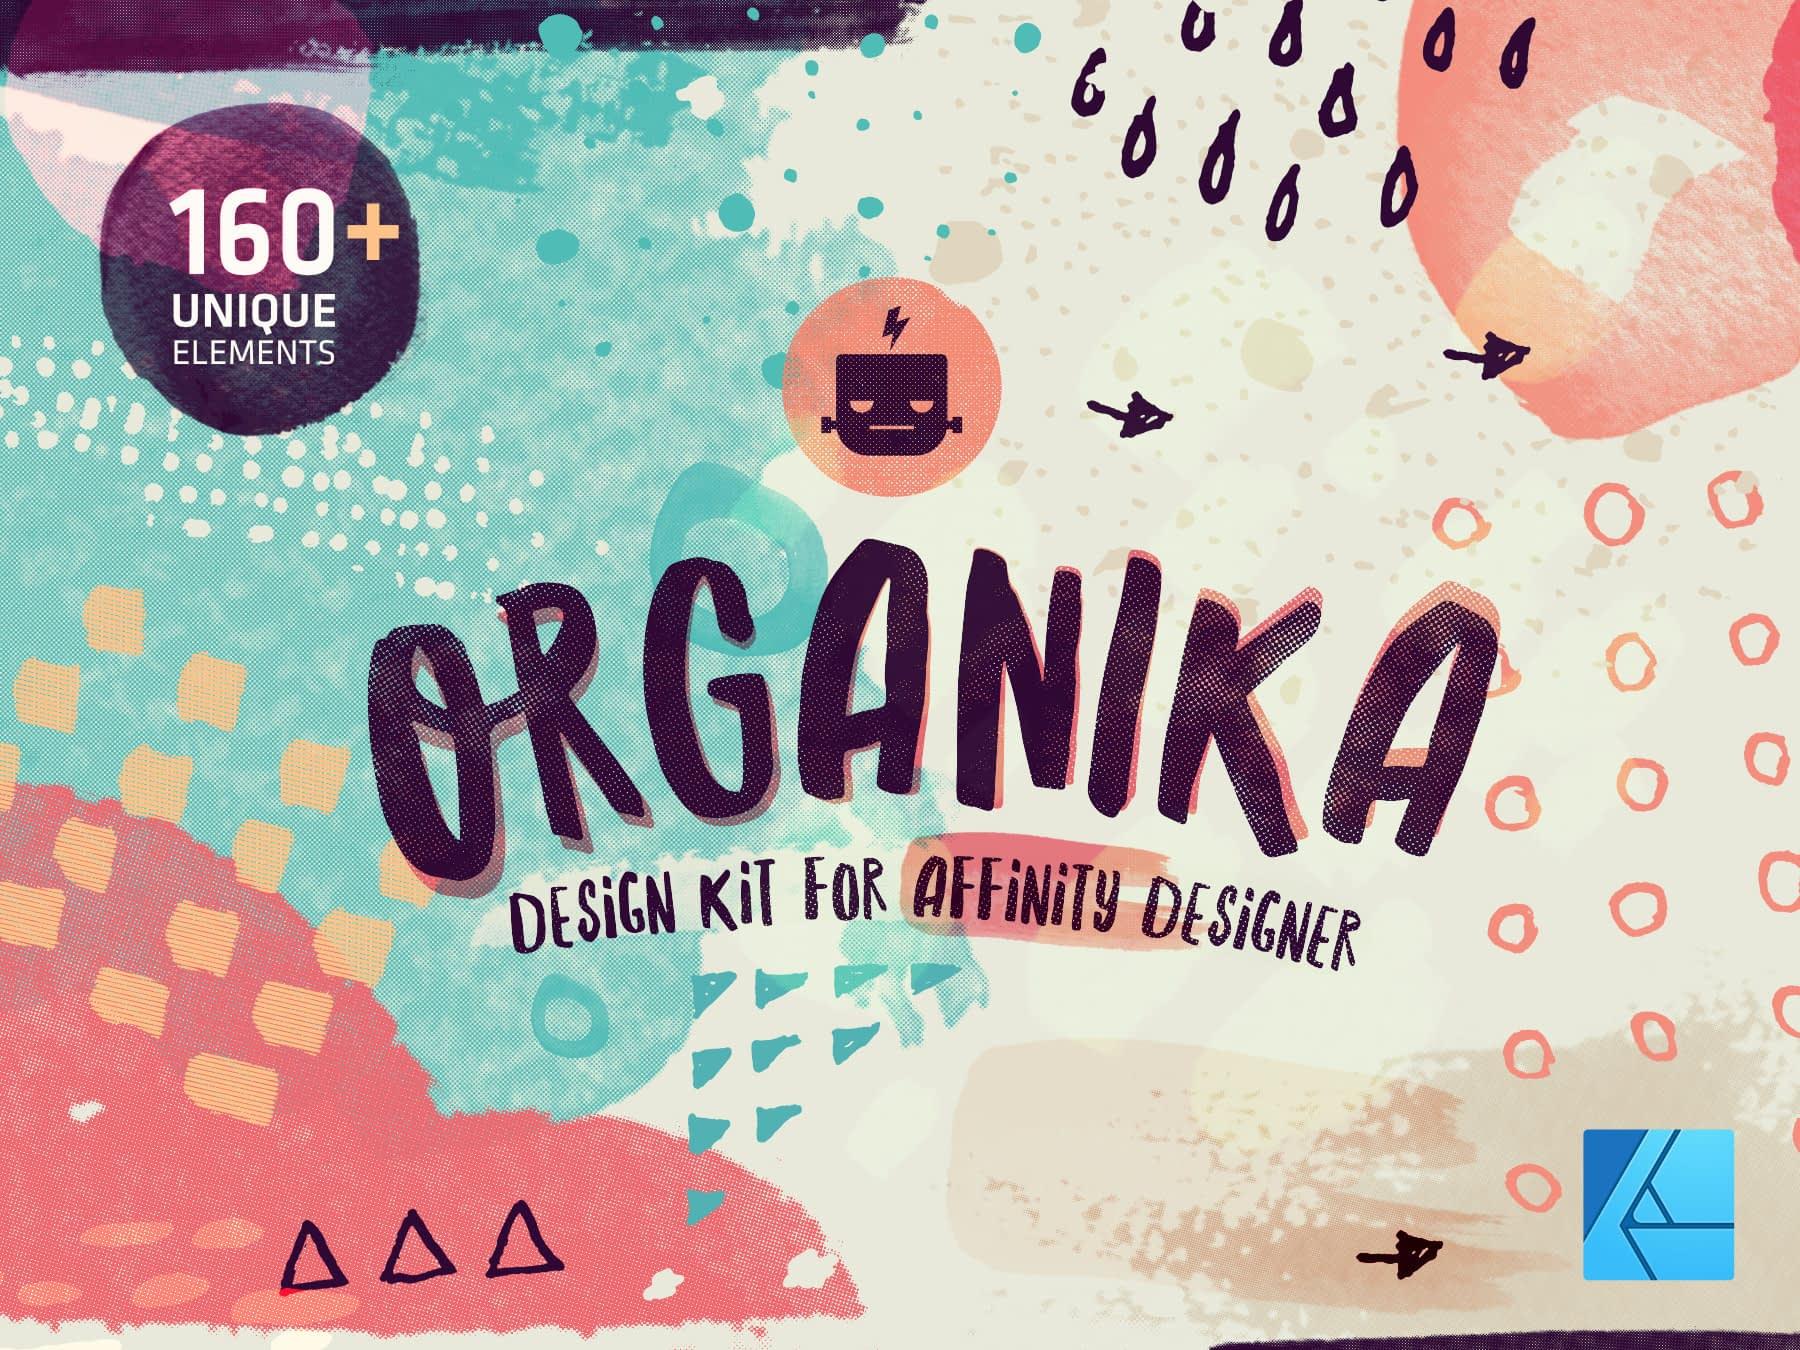 Organika Design Kit for Affinity Designer